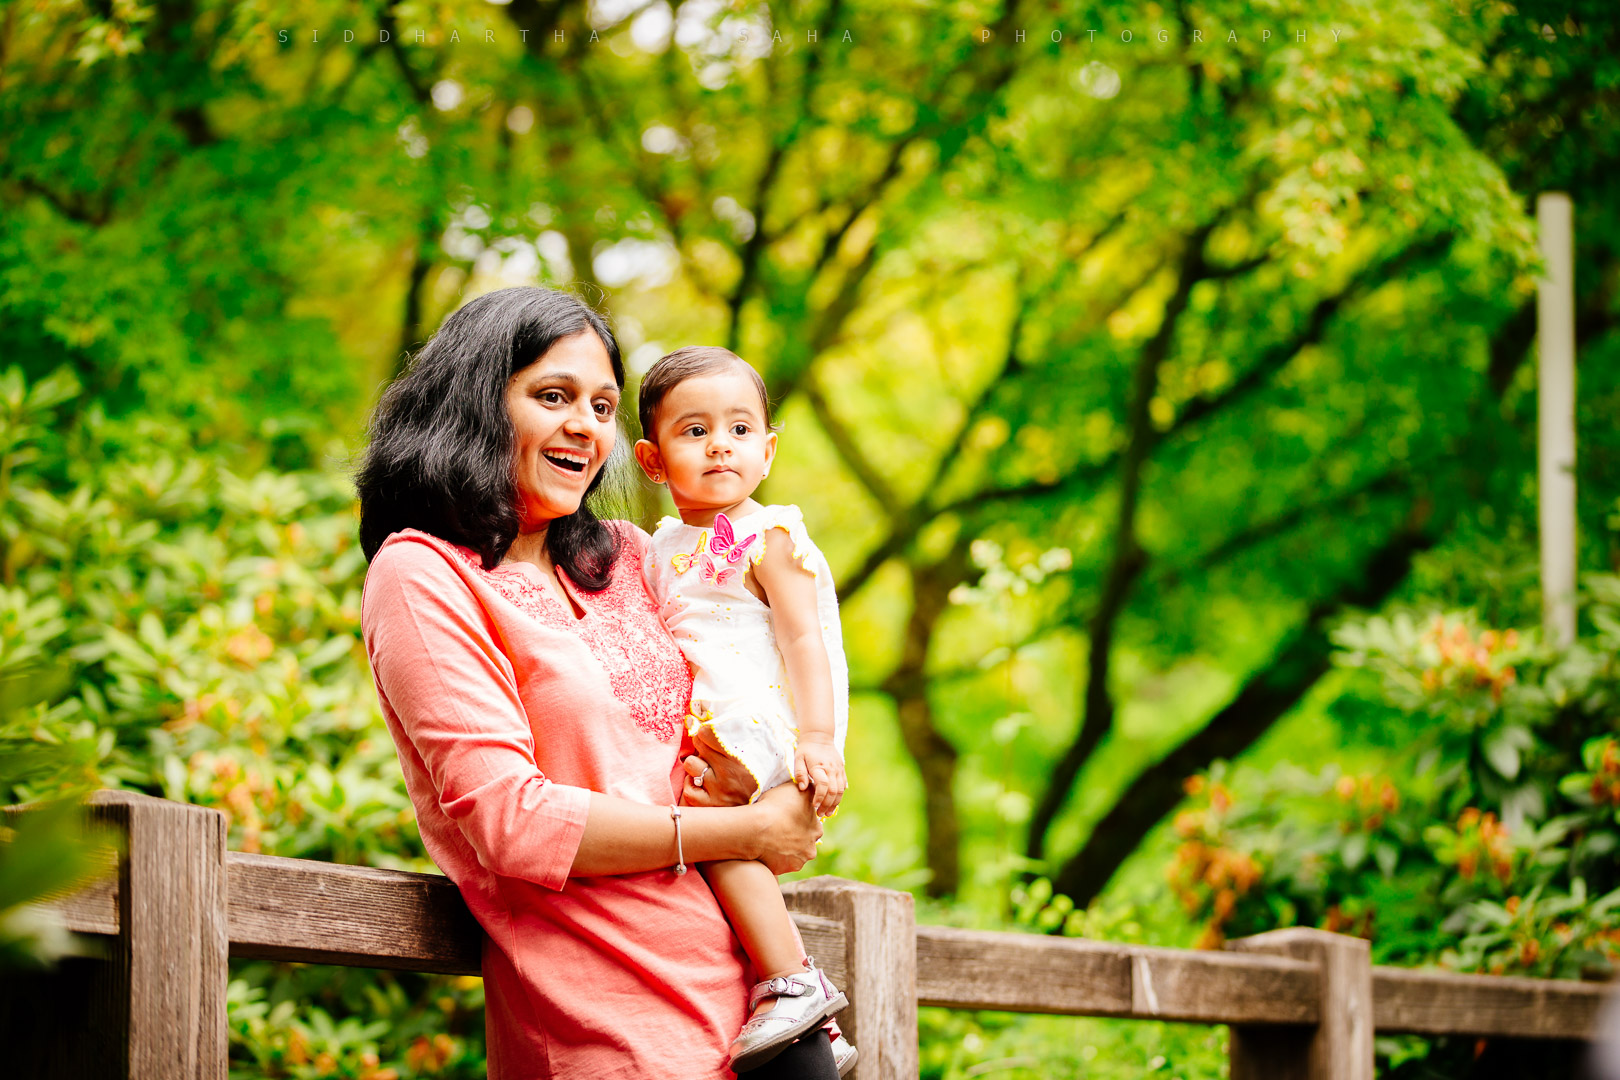 2015-08-08 - Padmaja Ketan Family Photoshoot - _05Y7902